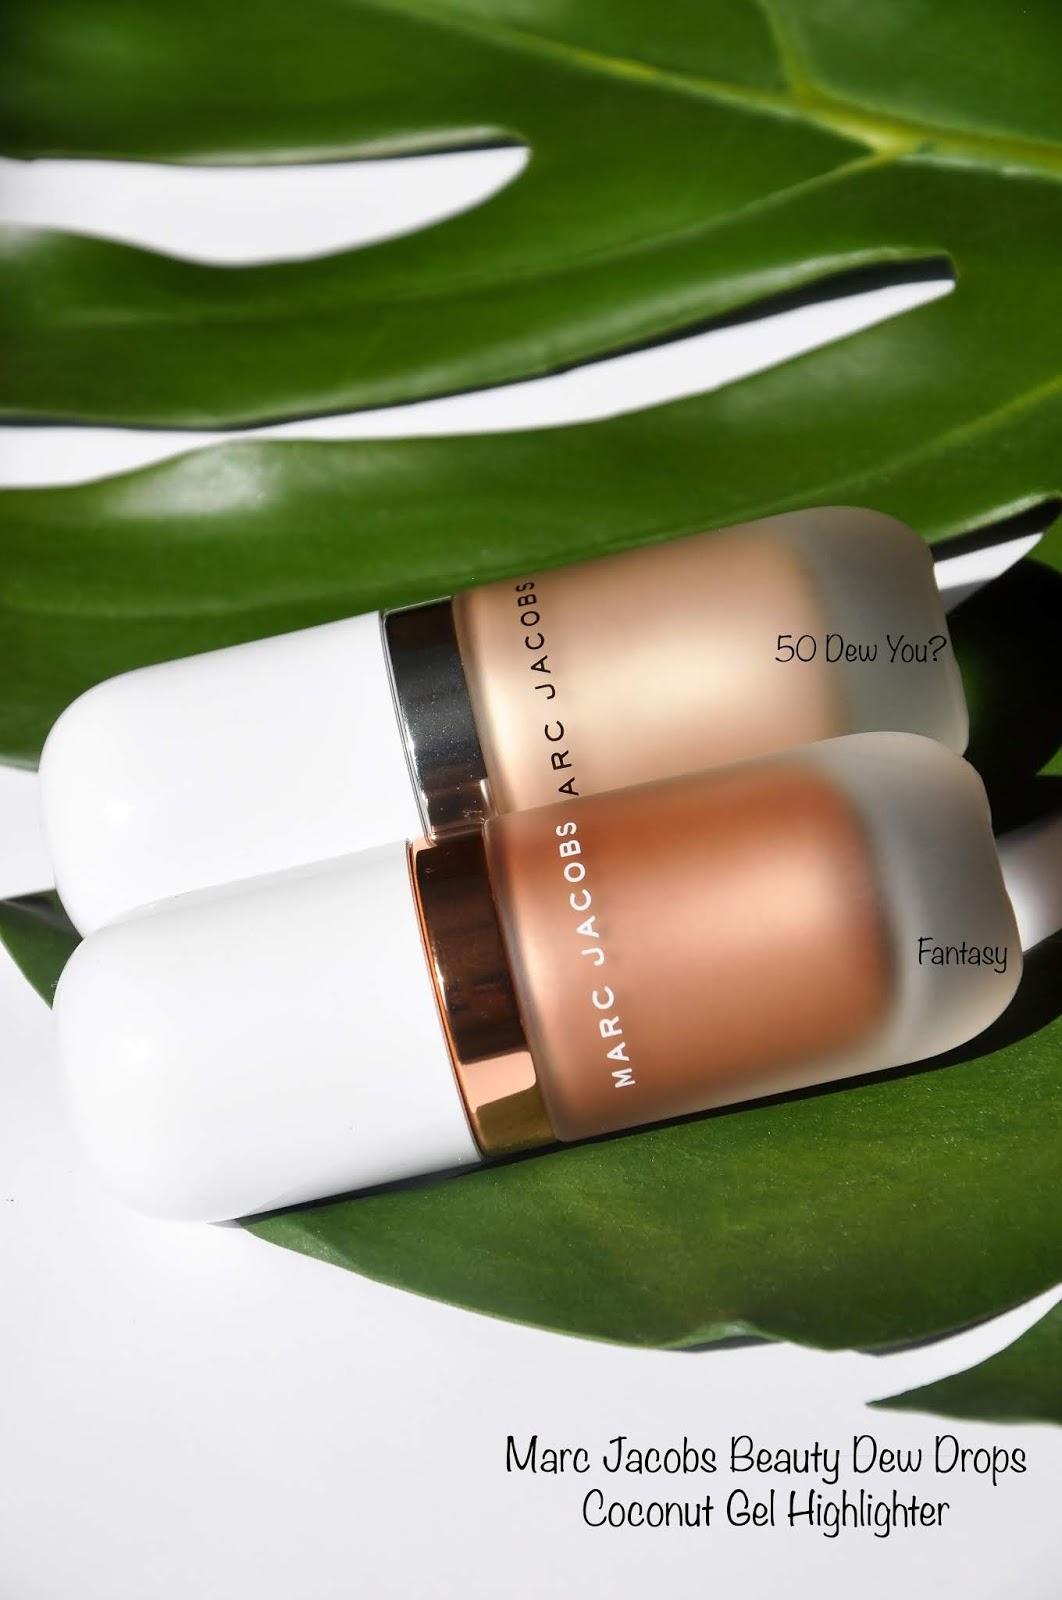 Marc Jacobs Beauty | Dew Drops Coconut Gel Highlighter Dew you & Fantasy